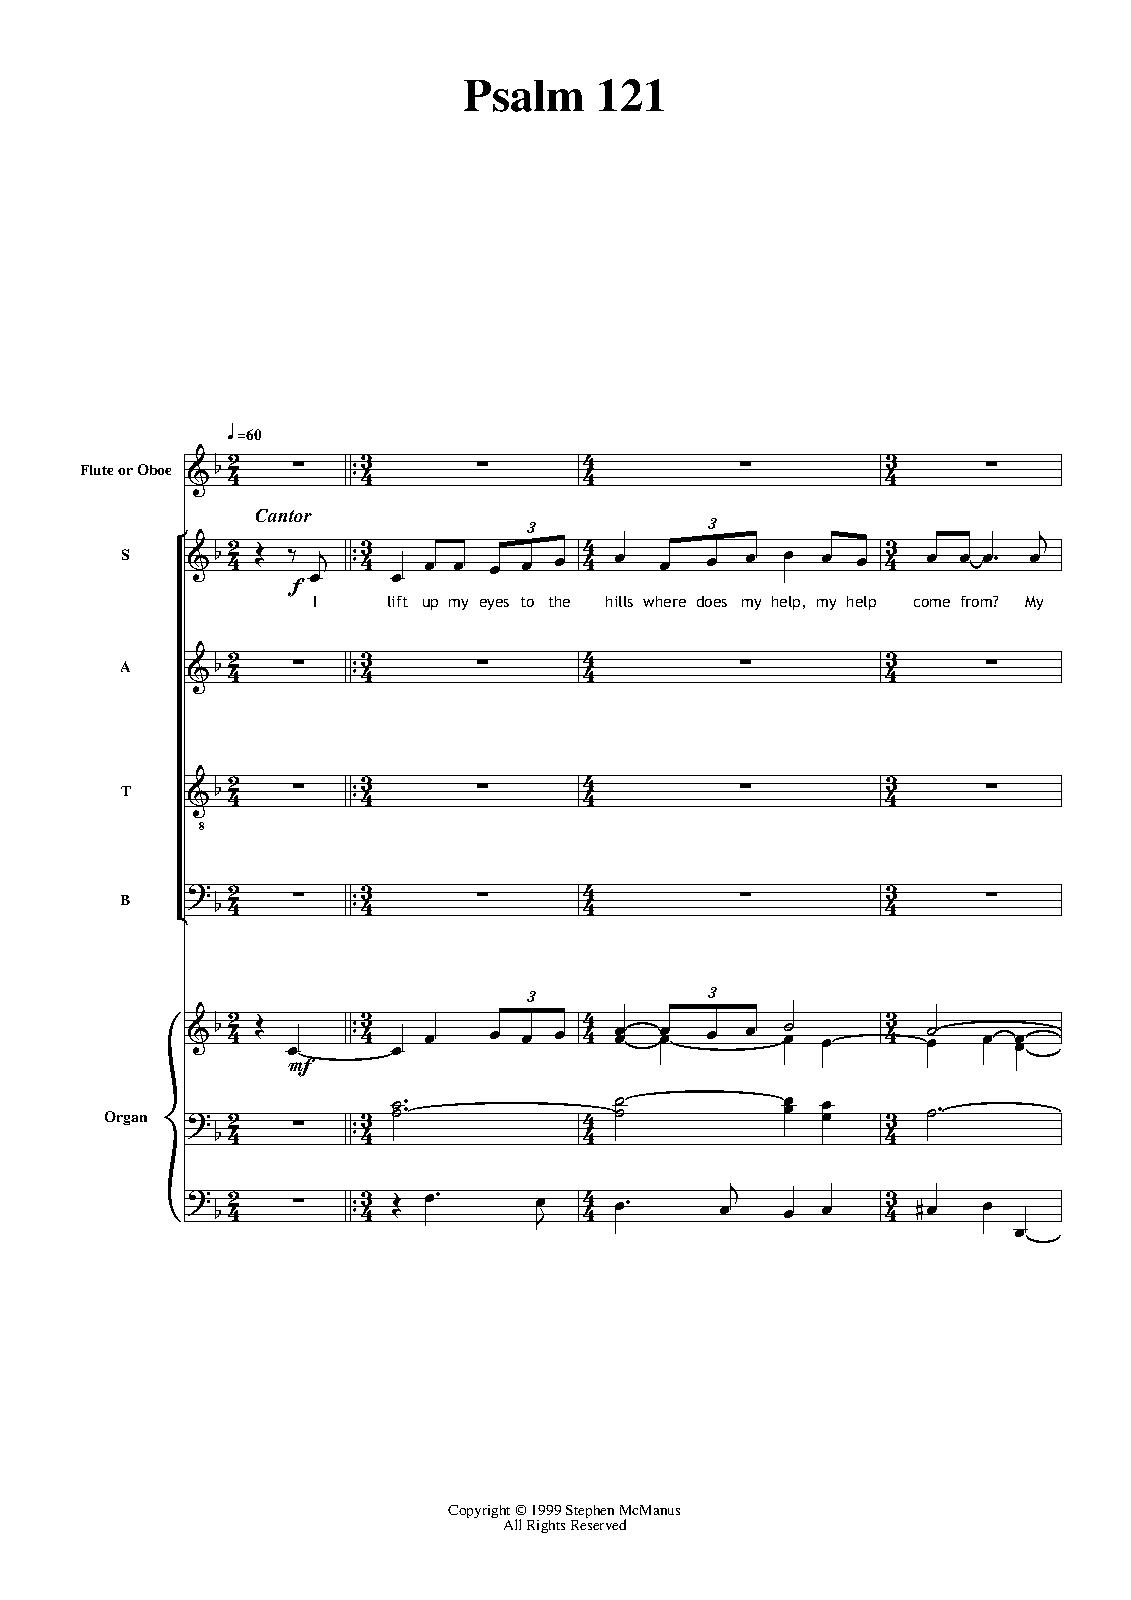 Psalm 121 (McManus, Stephen) - IMSLP/Petrucci Music Library: Free ...